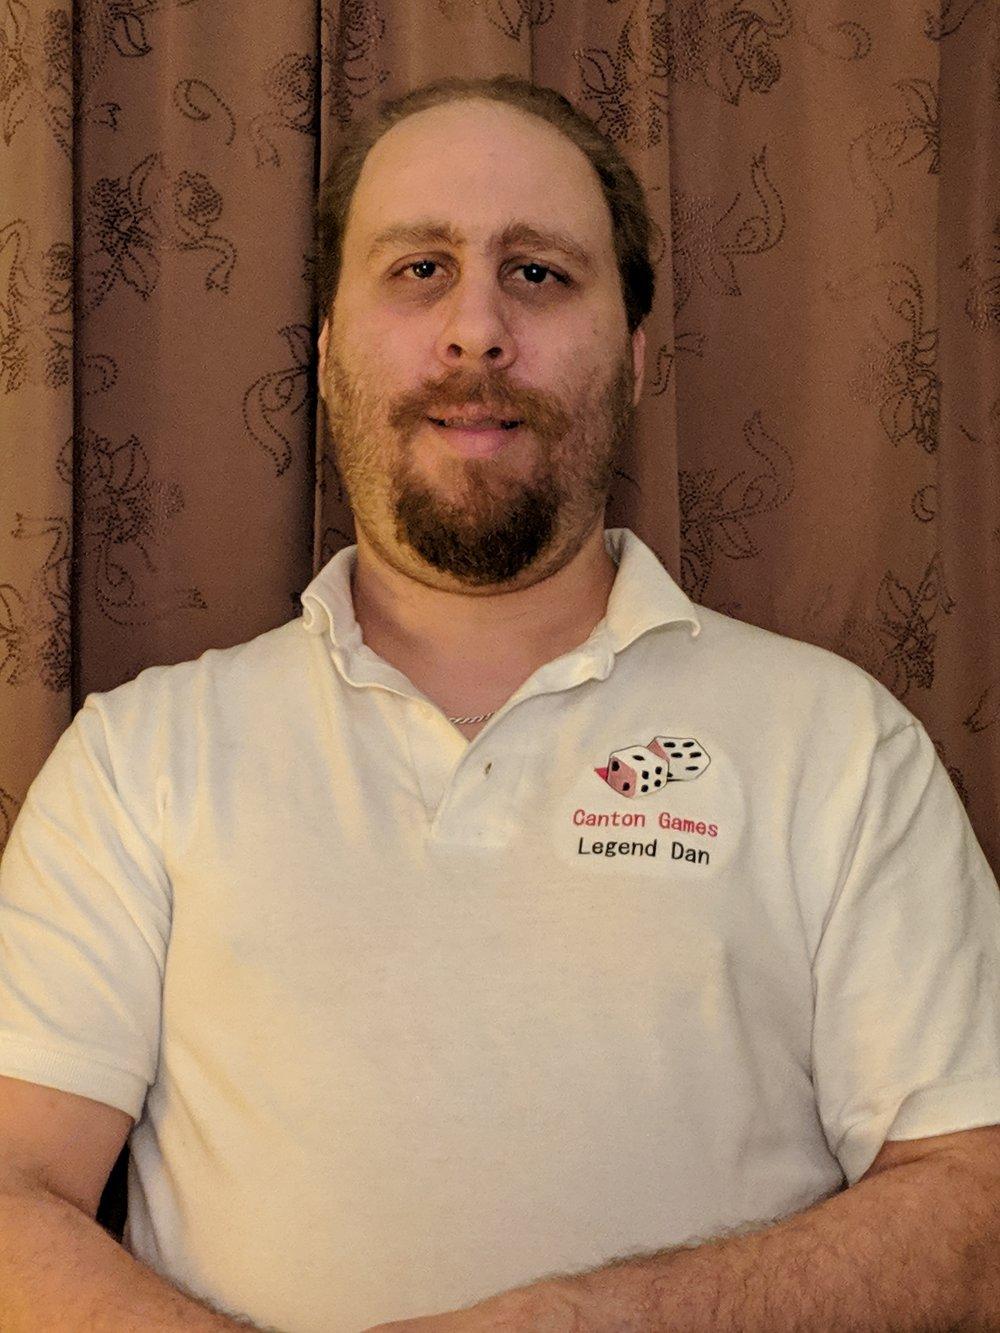 Dan Hoffman, owner of Canton Games